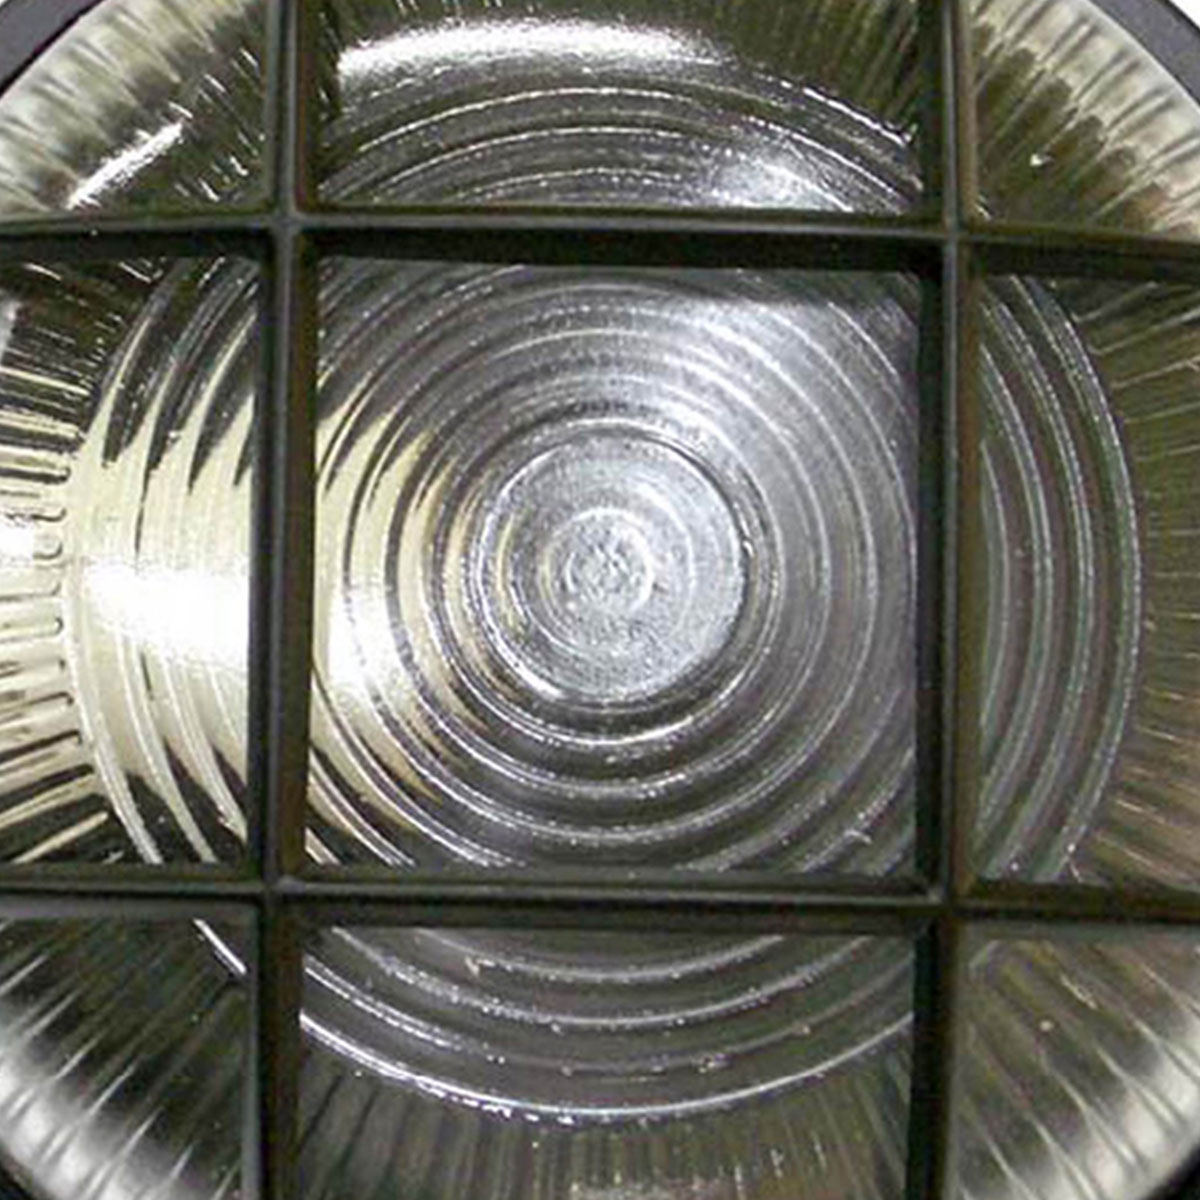 Tartaruga Circular 18cm Aluminio Pint. Epoxi E-27 1 Lamp. Max 60w C/ Grade Preta